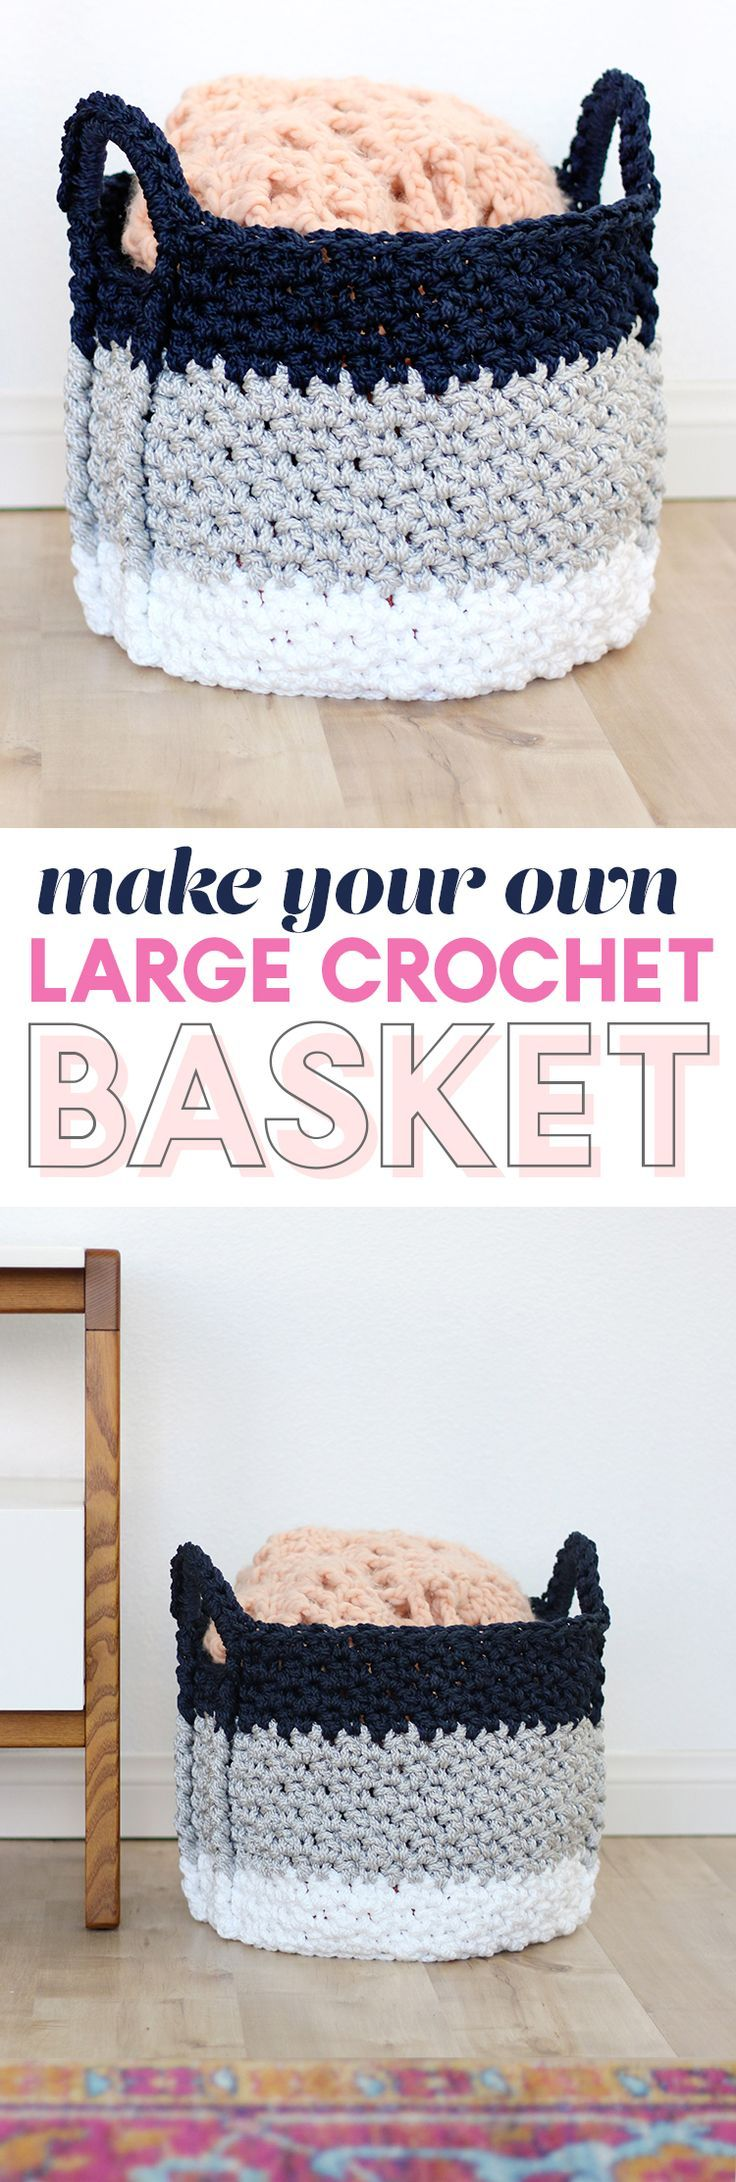 free crochet basket pattern - large crochet basket with handles